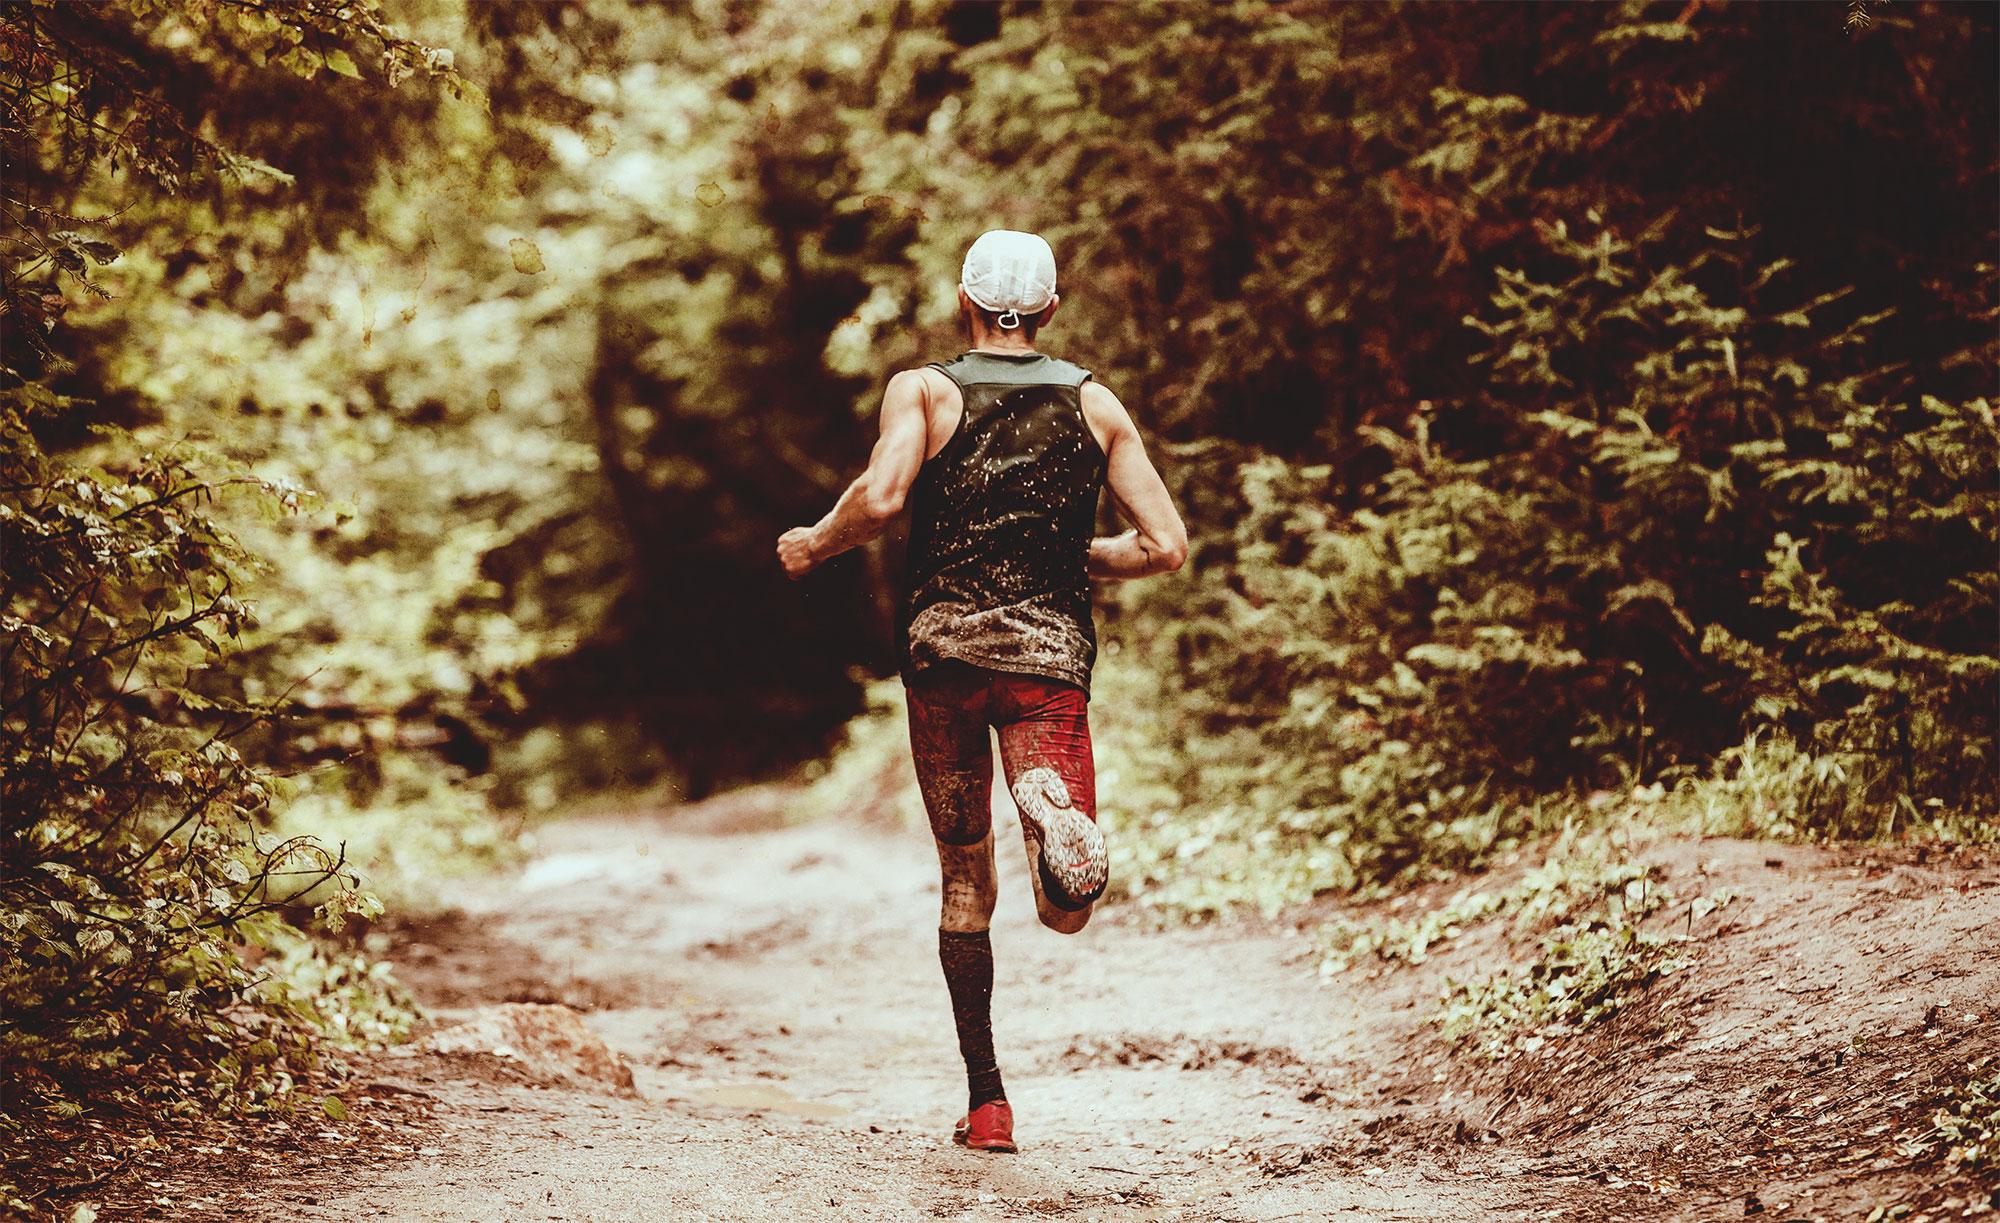 The Dirty Mitten Gravel Triathlon Set to Re-Debut September 2021